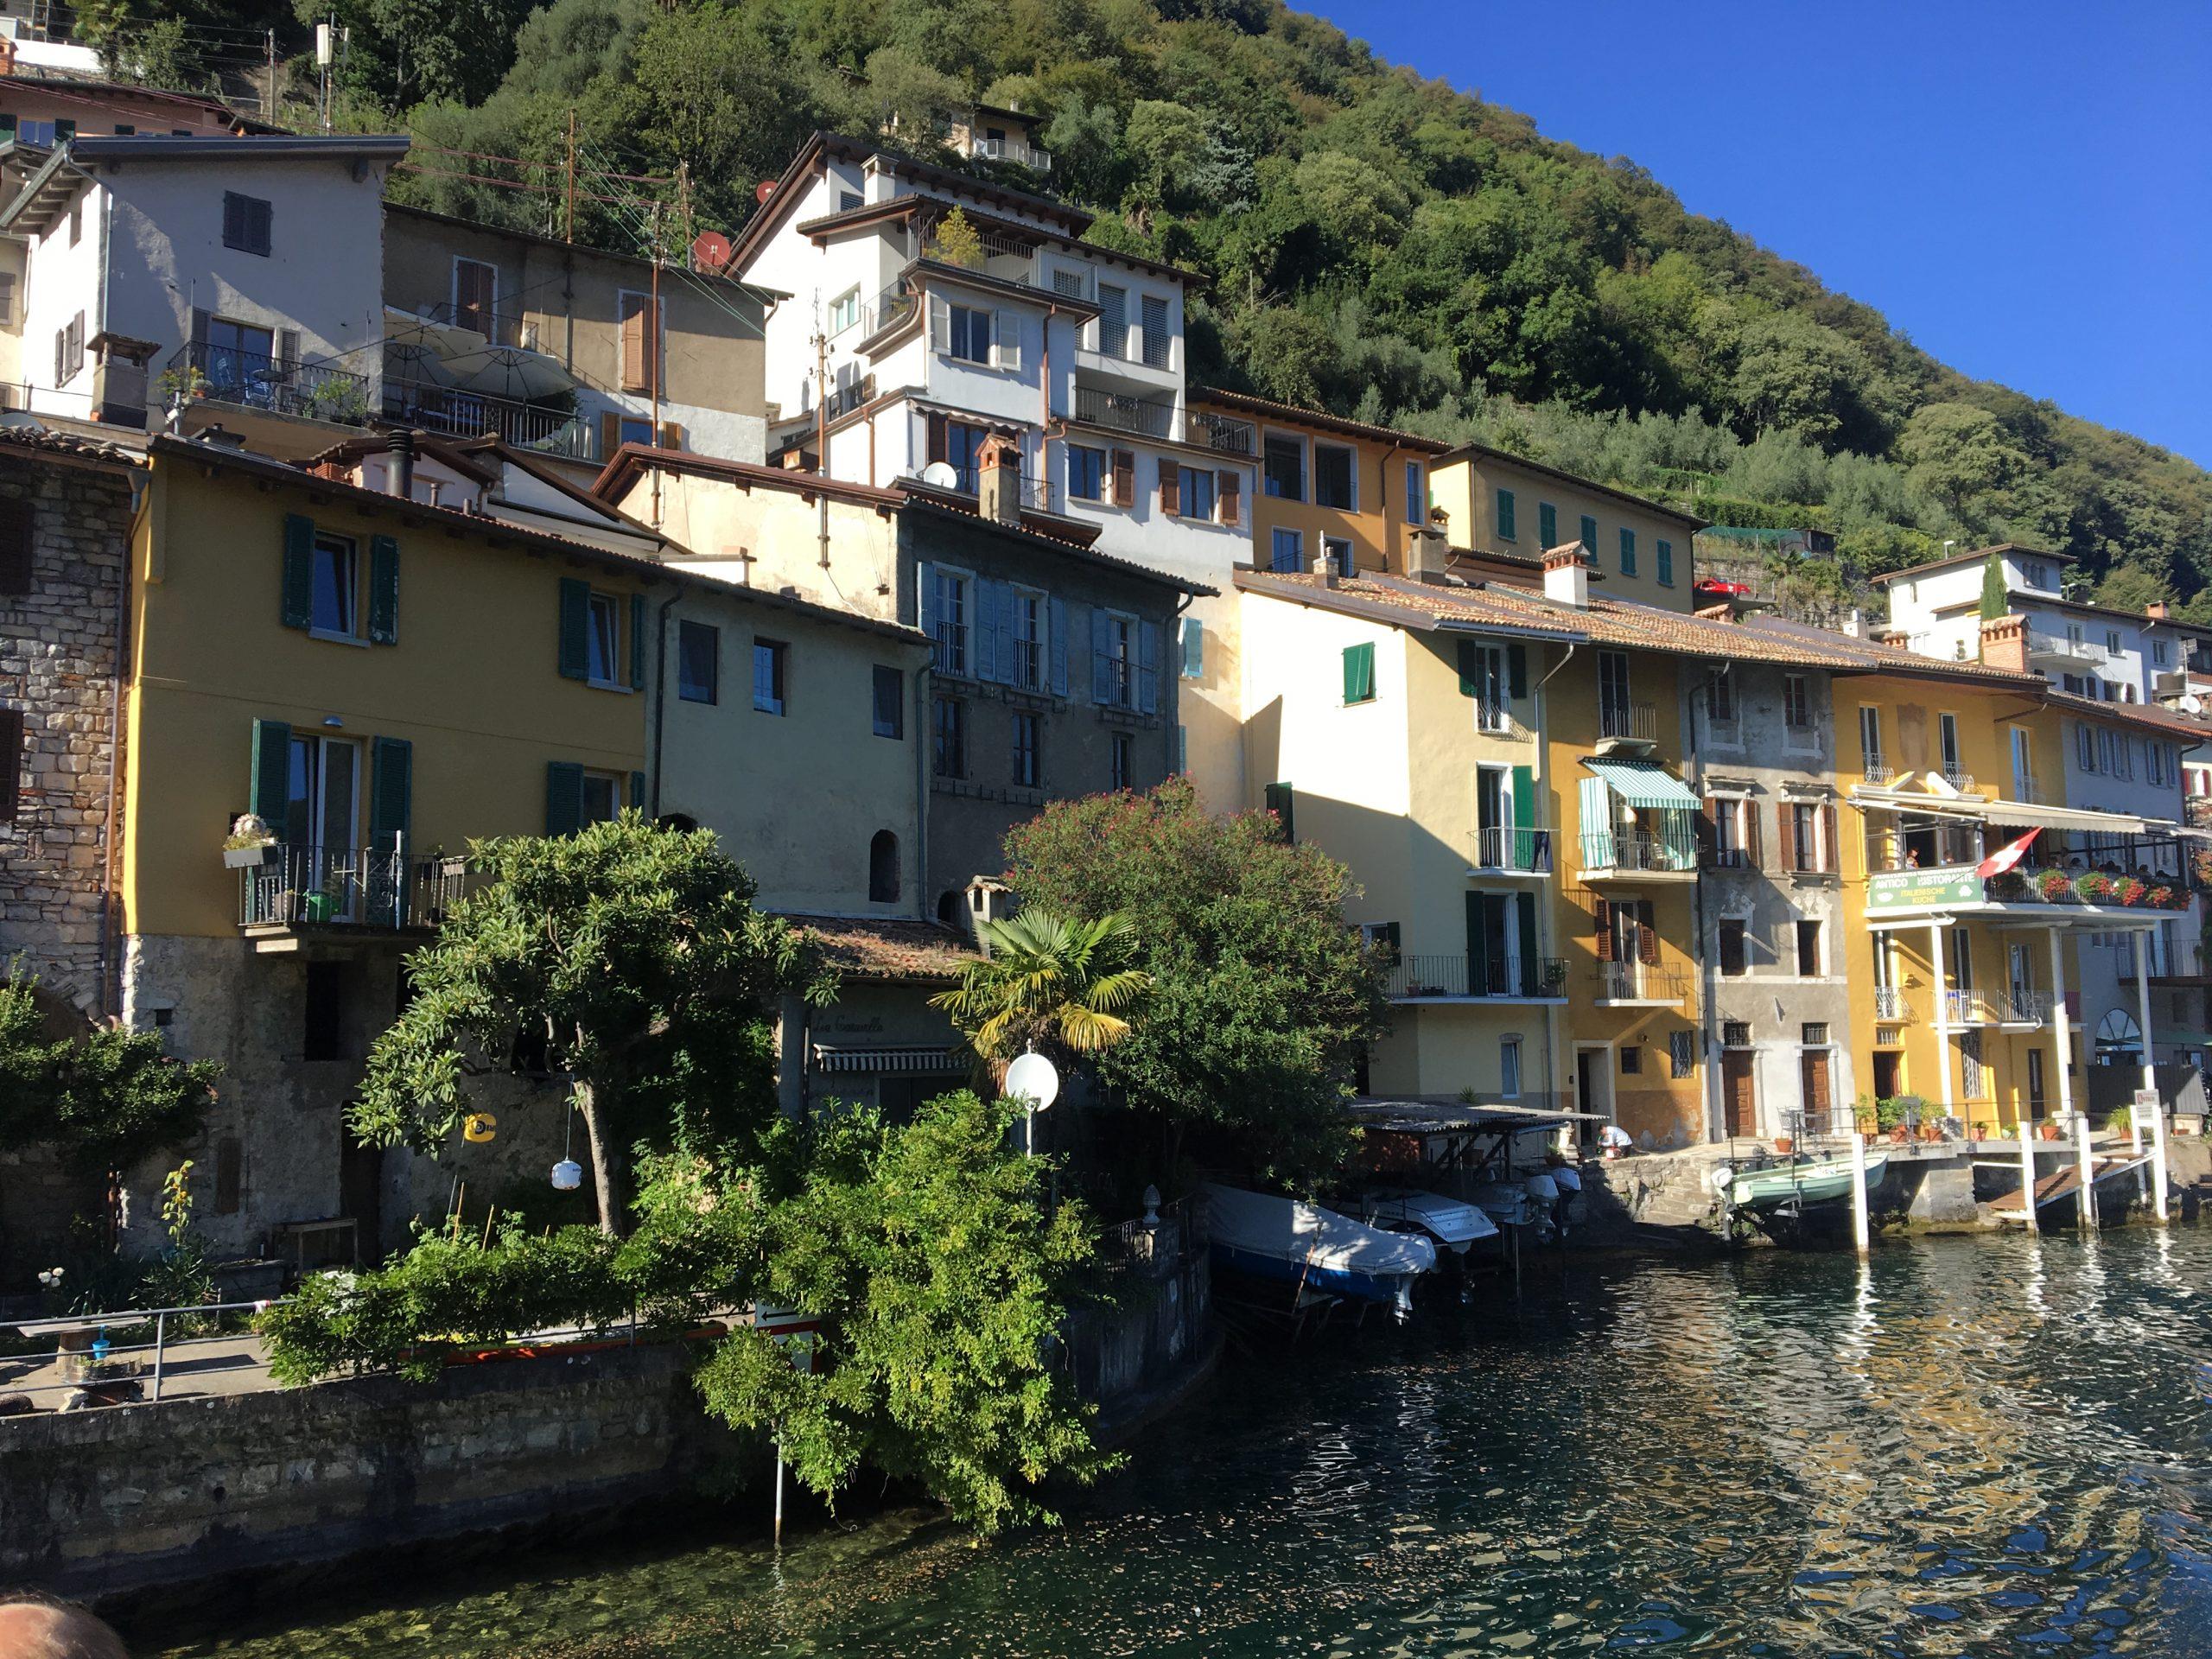 Lugano - Gandria